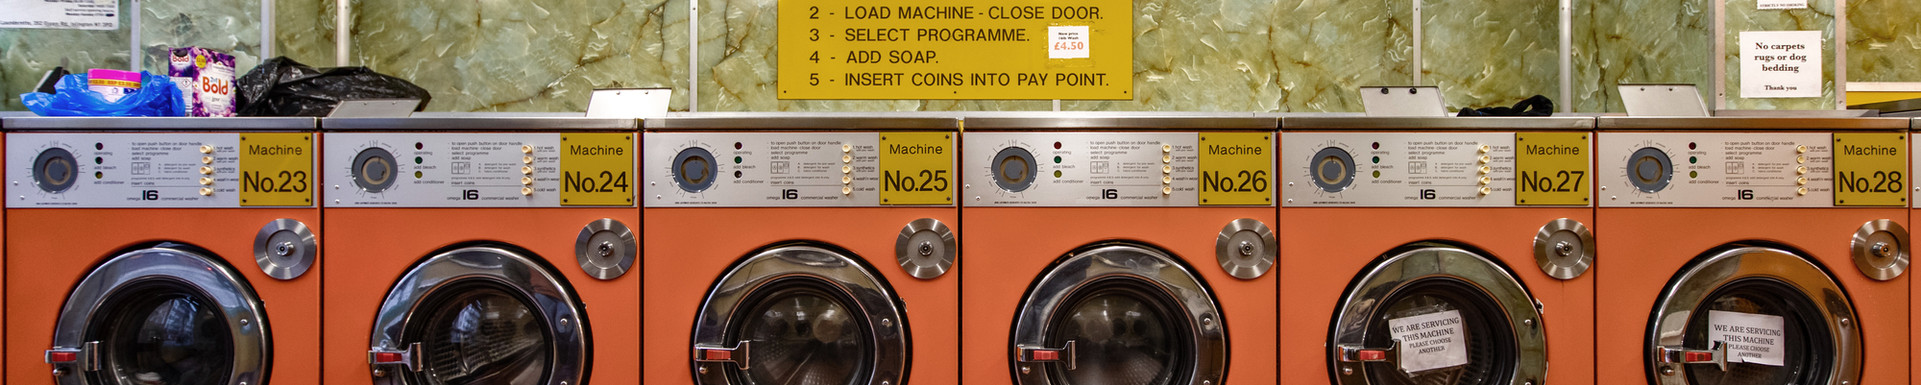 Washers_Launderette_Essex Rd N1 copy.jpg